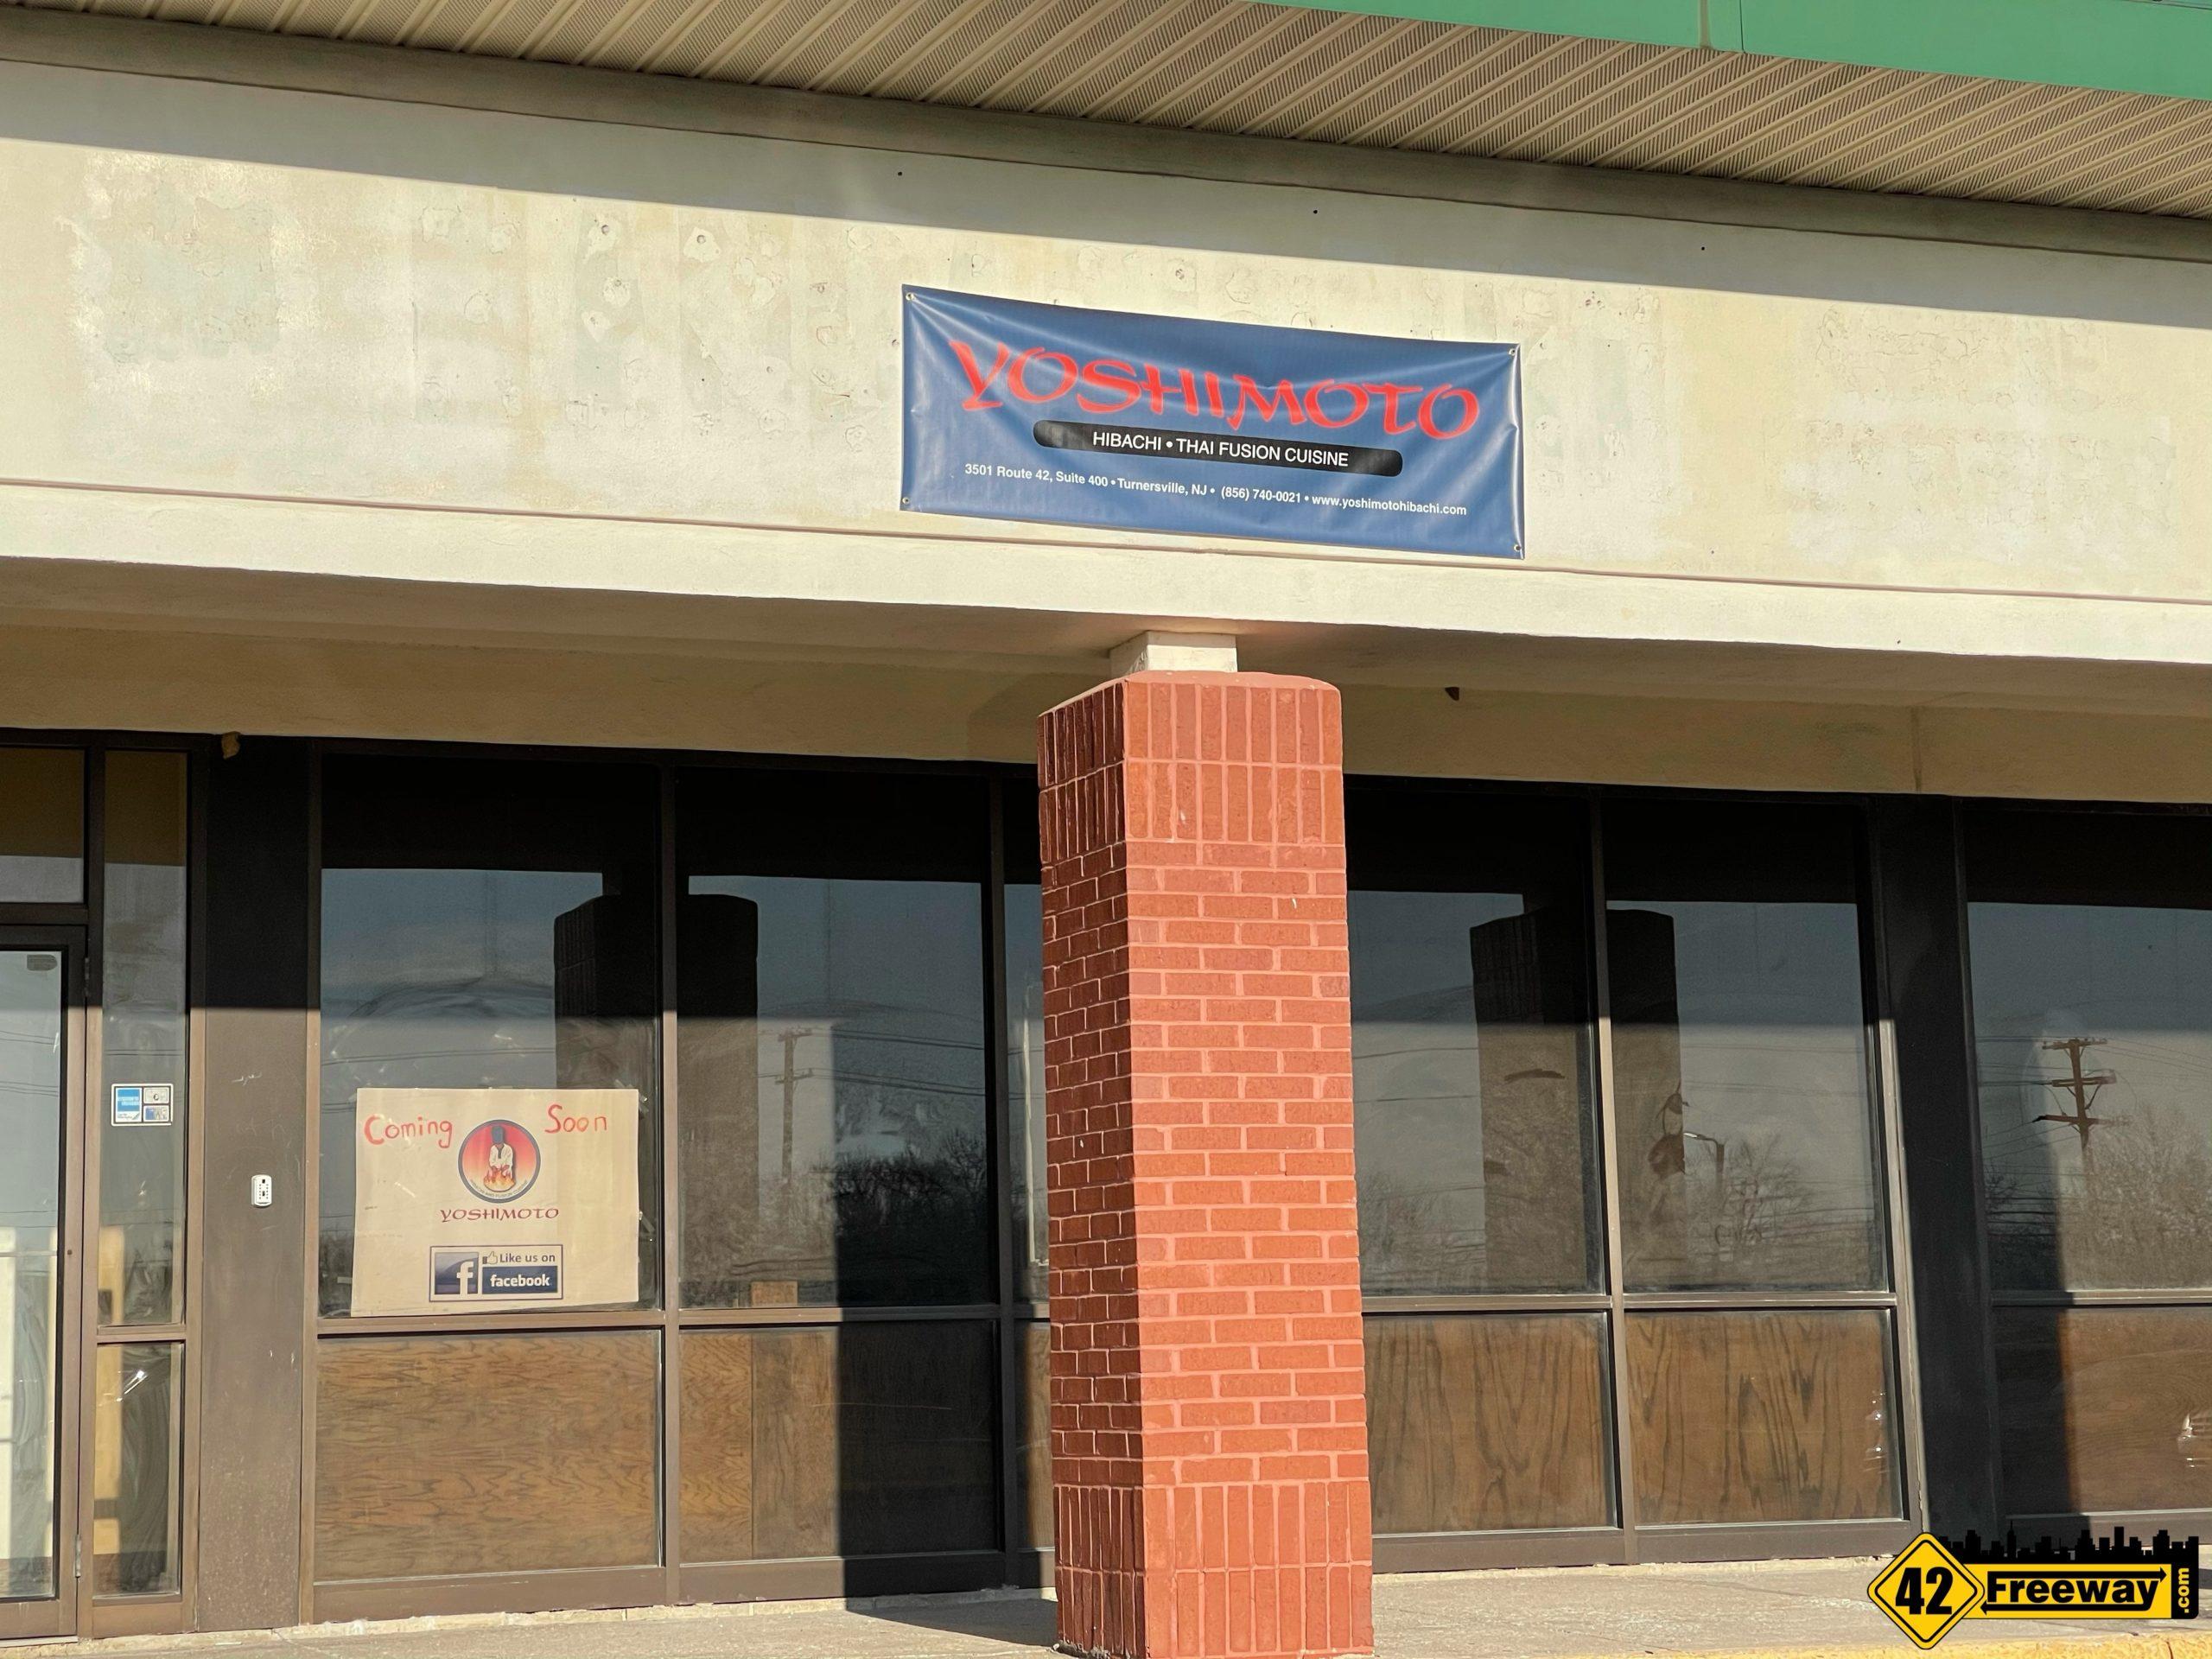 Yoshimoto 2 Coming to Hurffville-Crosskeys Road Washington Township.  Goodwill Shopping Center